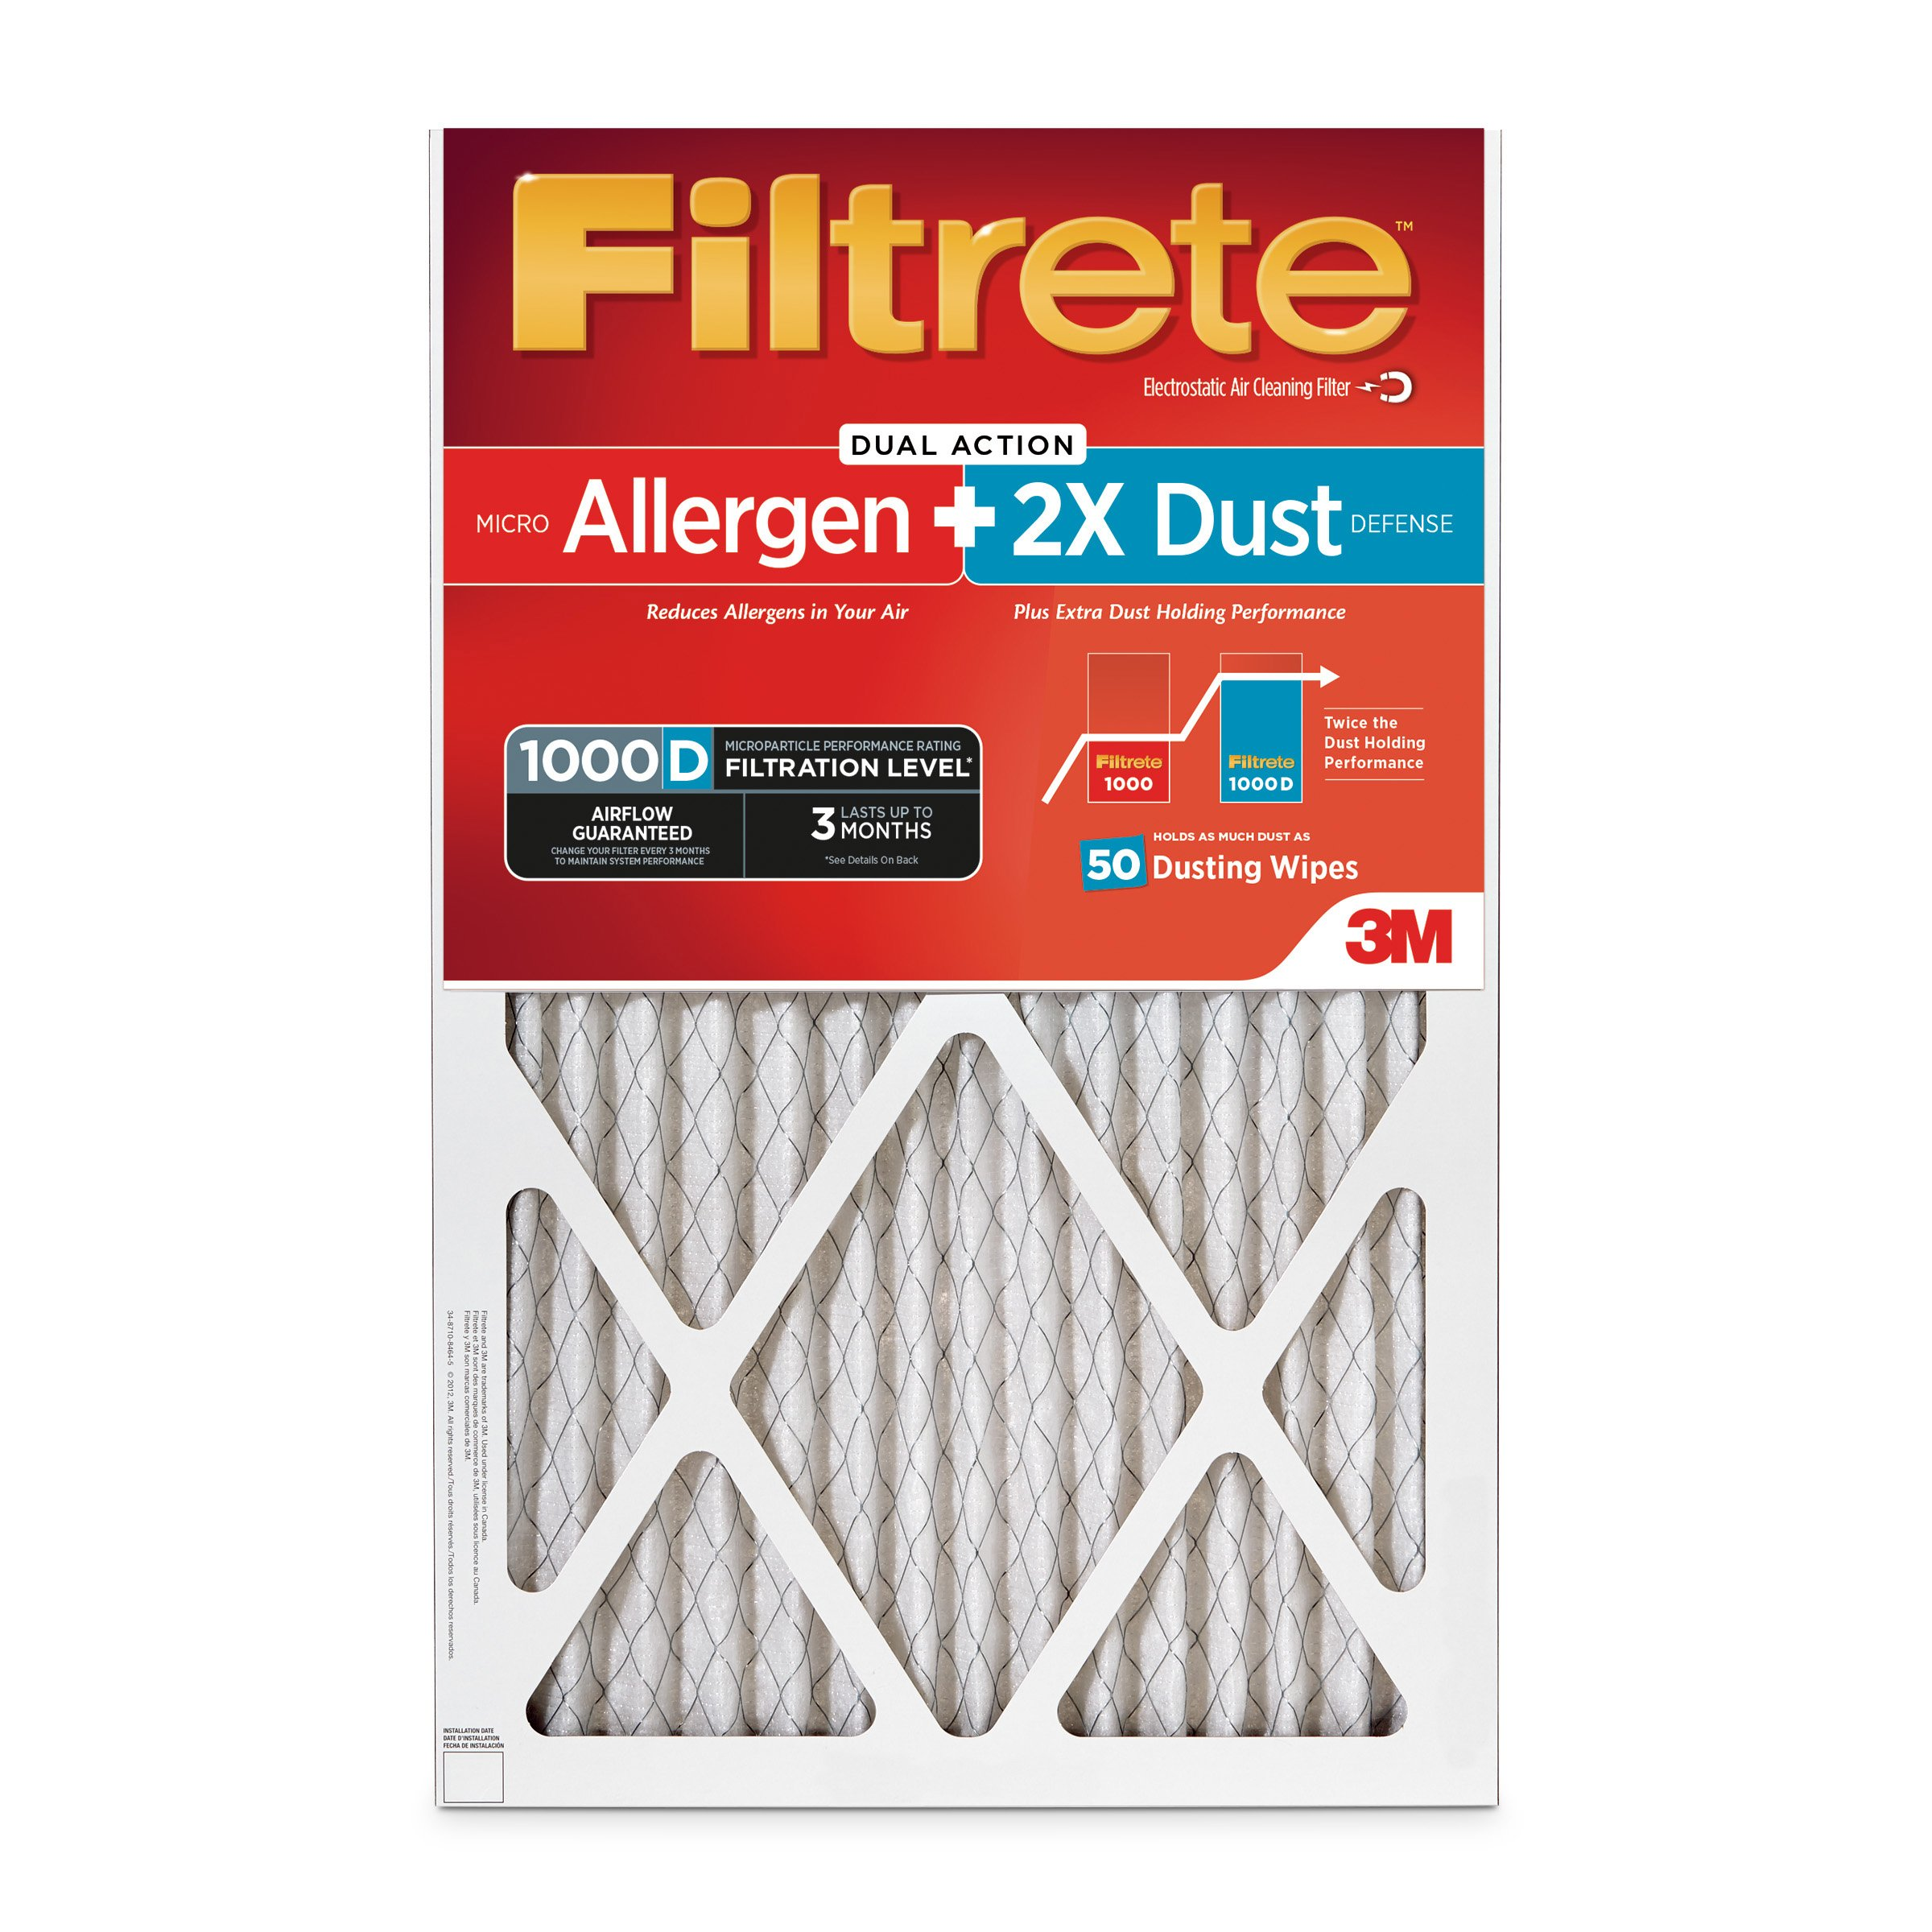 Filtrete MPR 1000D 14 x 20 x 1 Micro Allergen PLUS DUST HVAC Air Filter, 6-Pack